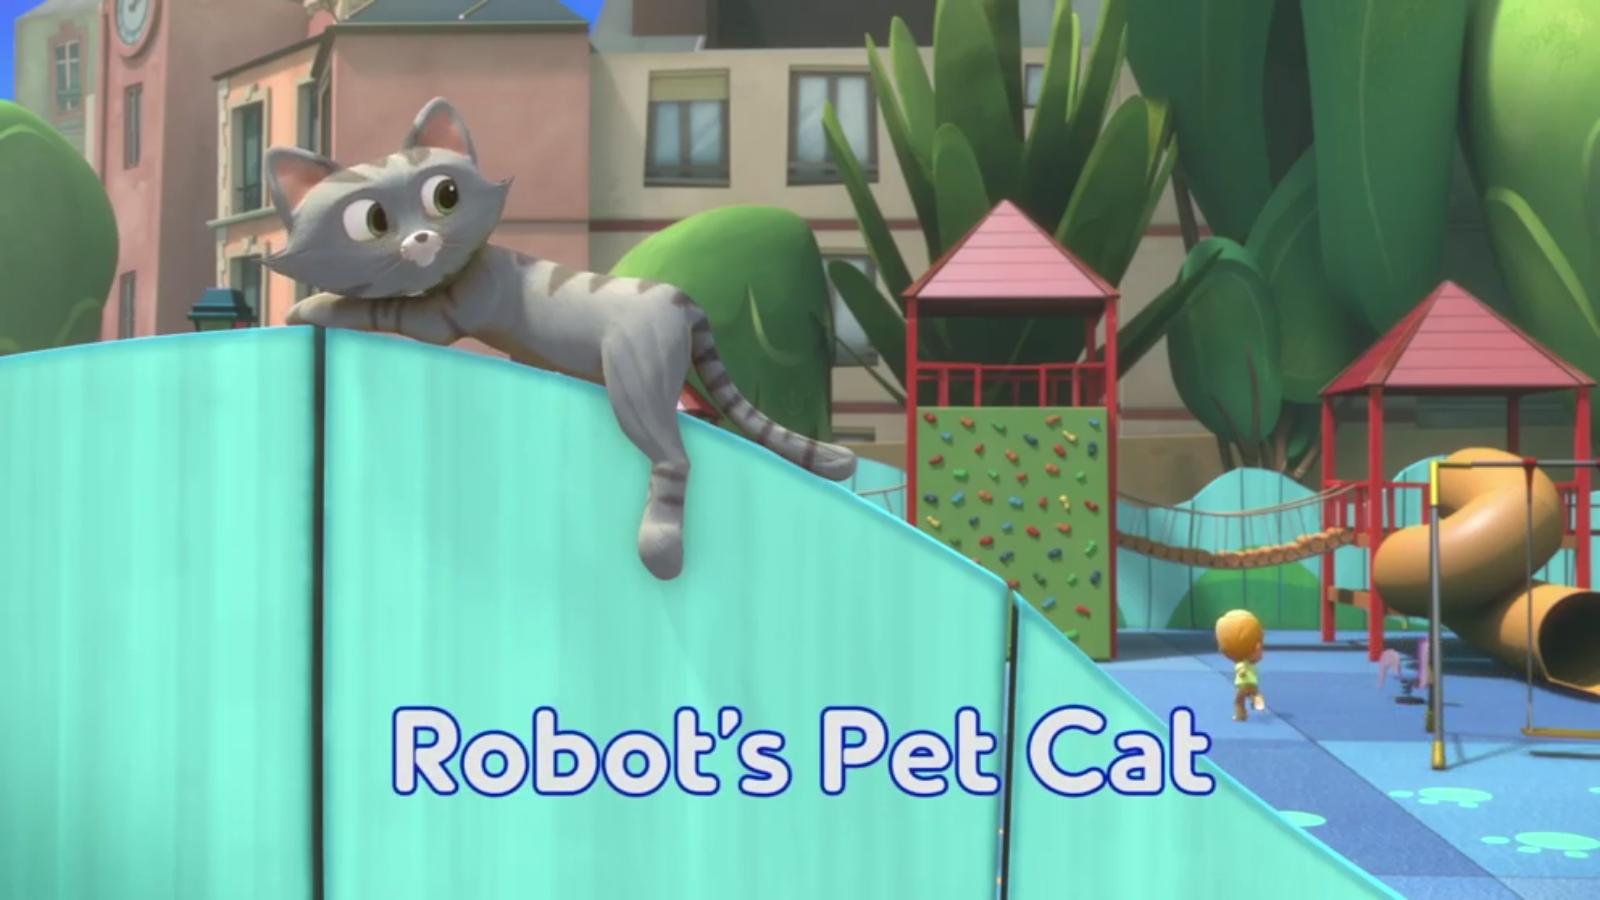 Robot's Pet Cat